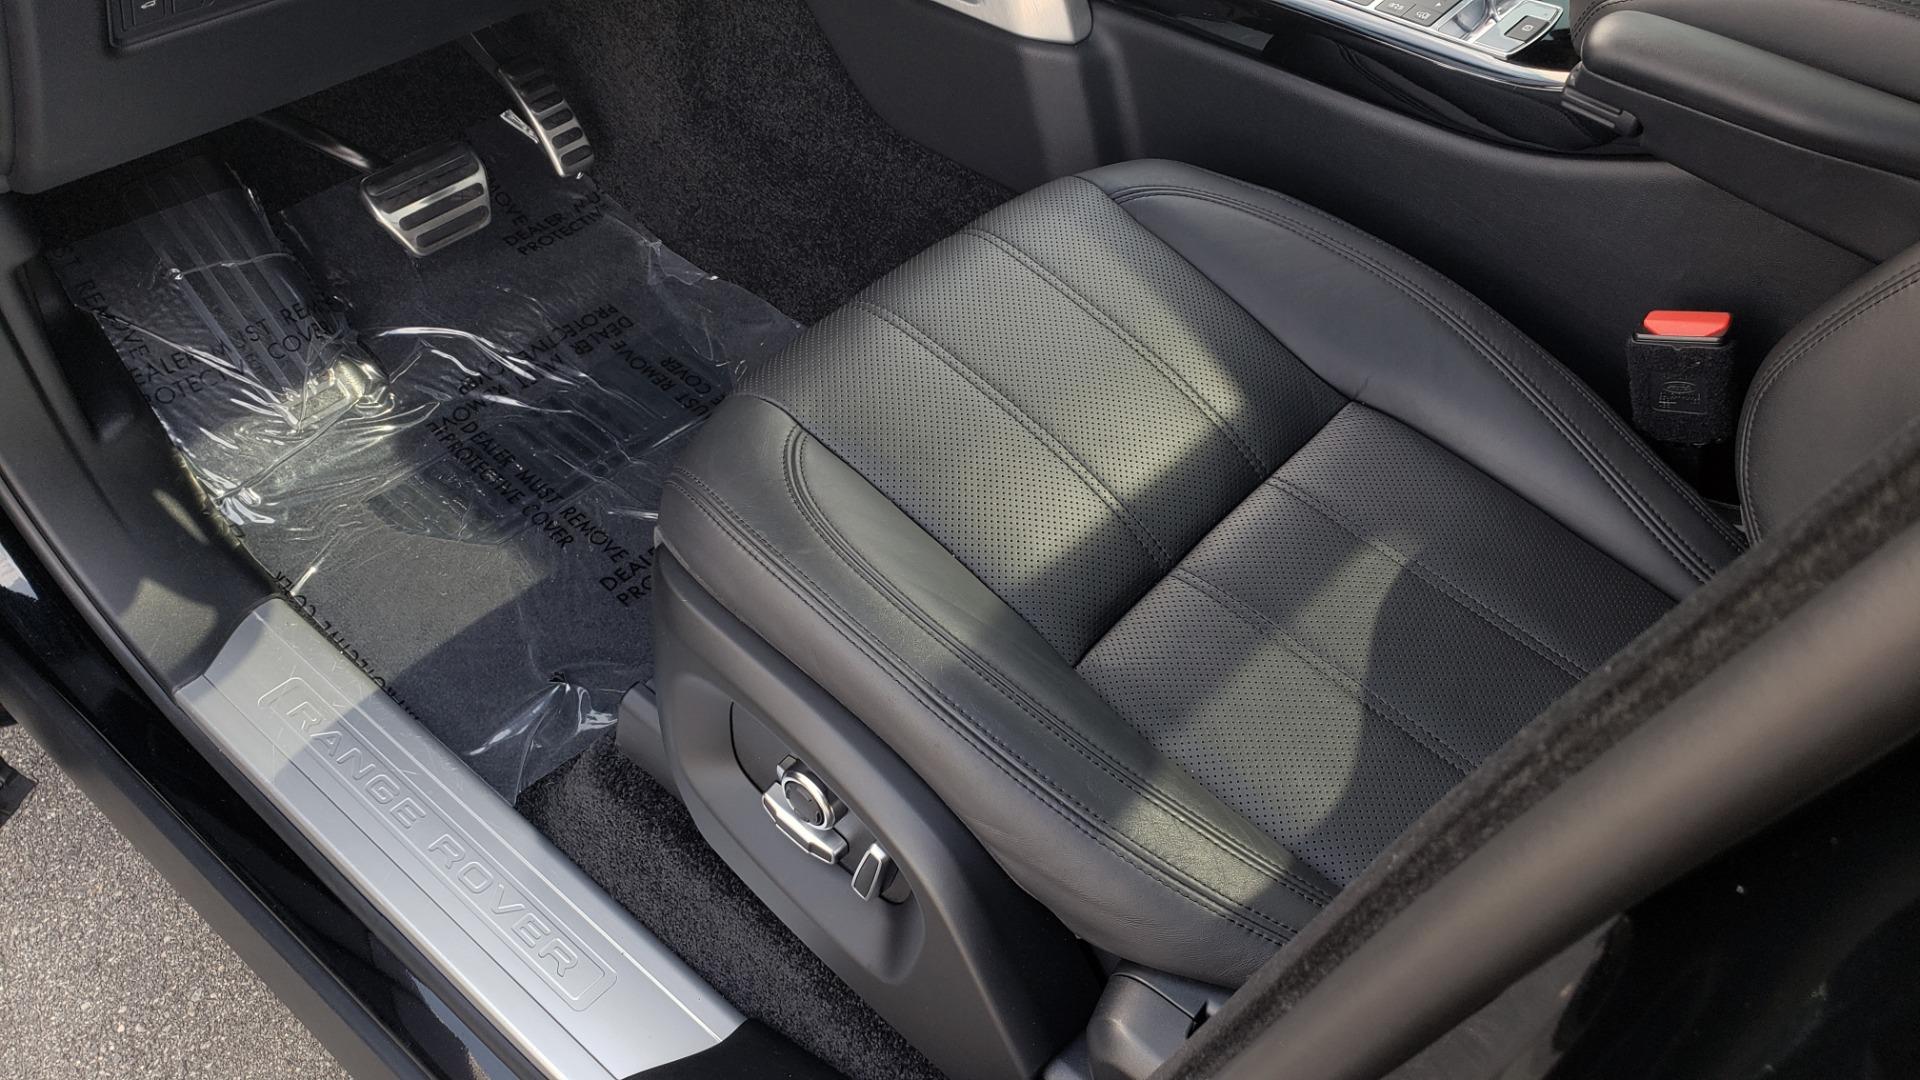 Used 2017 Land Rover RANGE ROVER SC V8 / VISION ASST / DRIVE PKG / MERIDIAN SOUND / PANO-ROOF / NAV / BSM for sale $75,995 at Formula Imports in Charlotte NC 28227 38